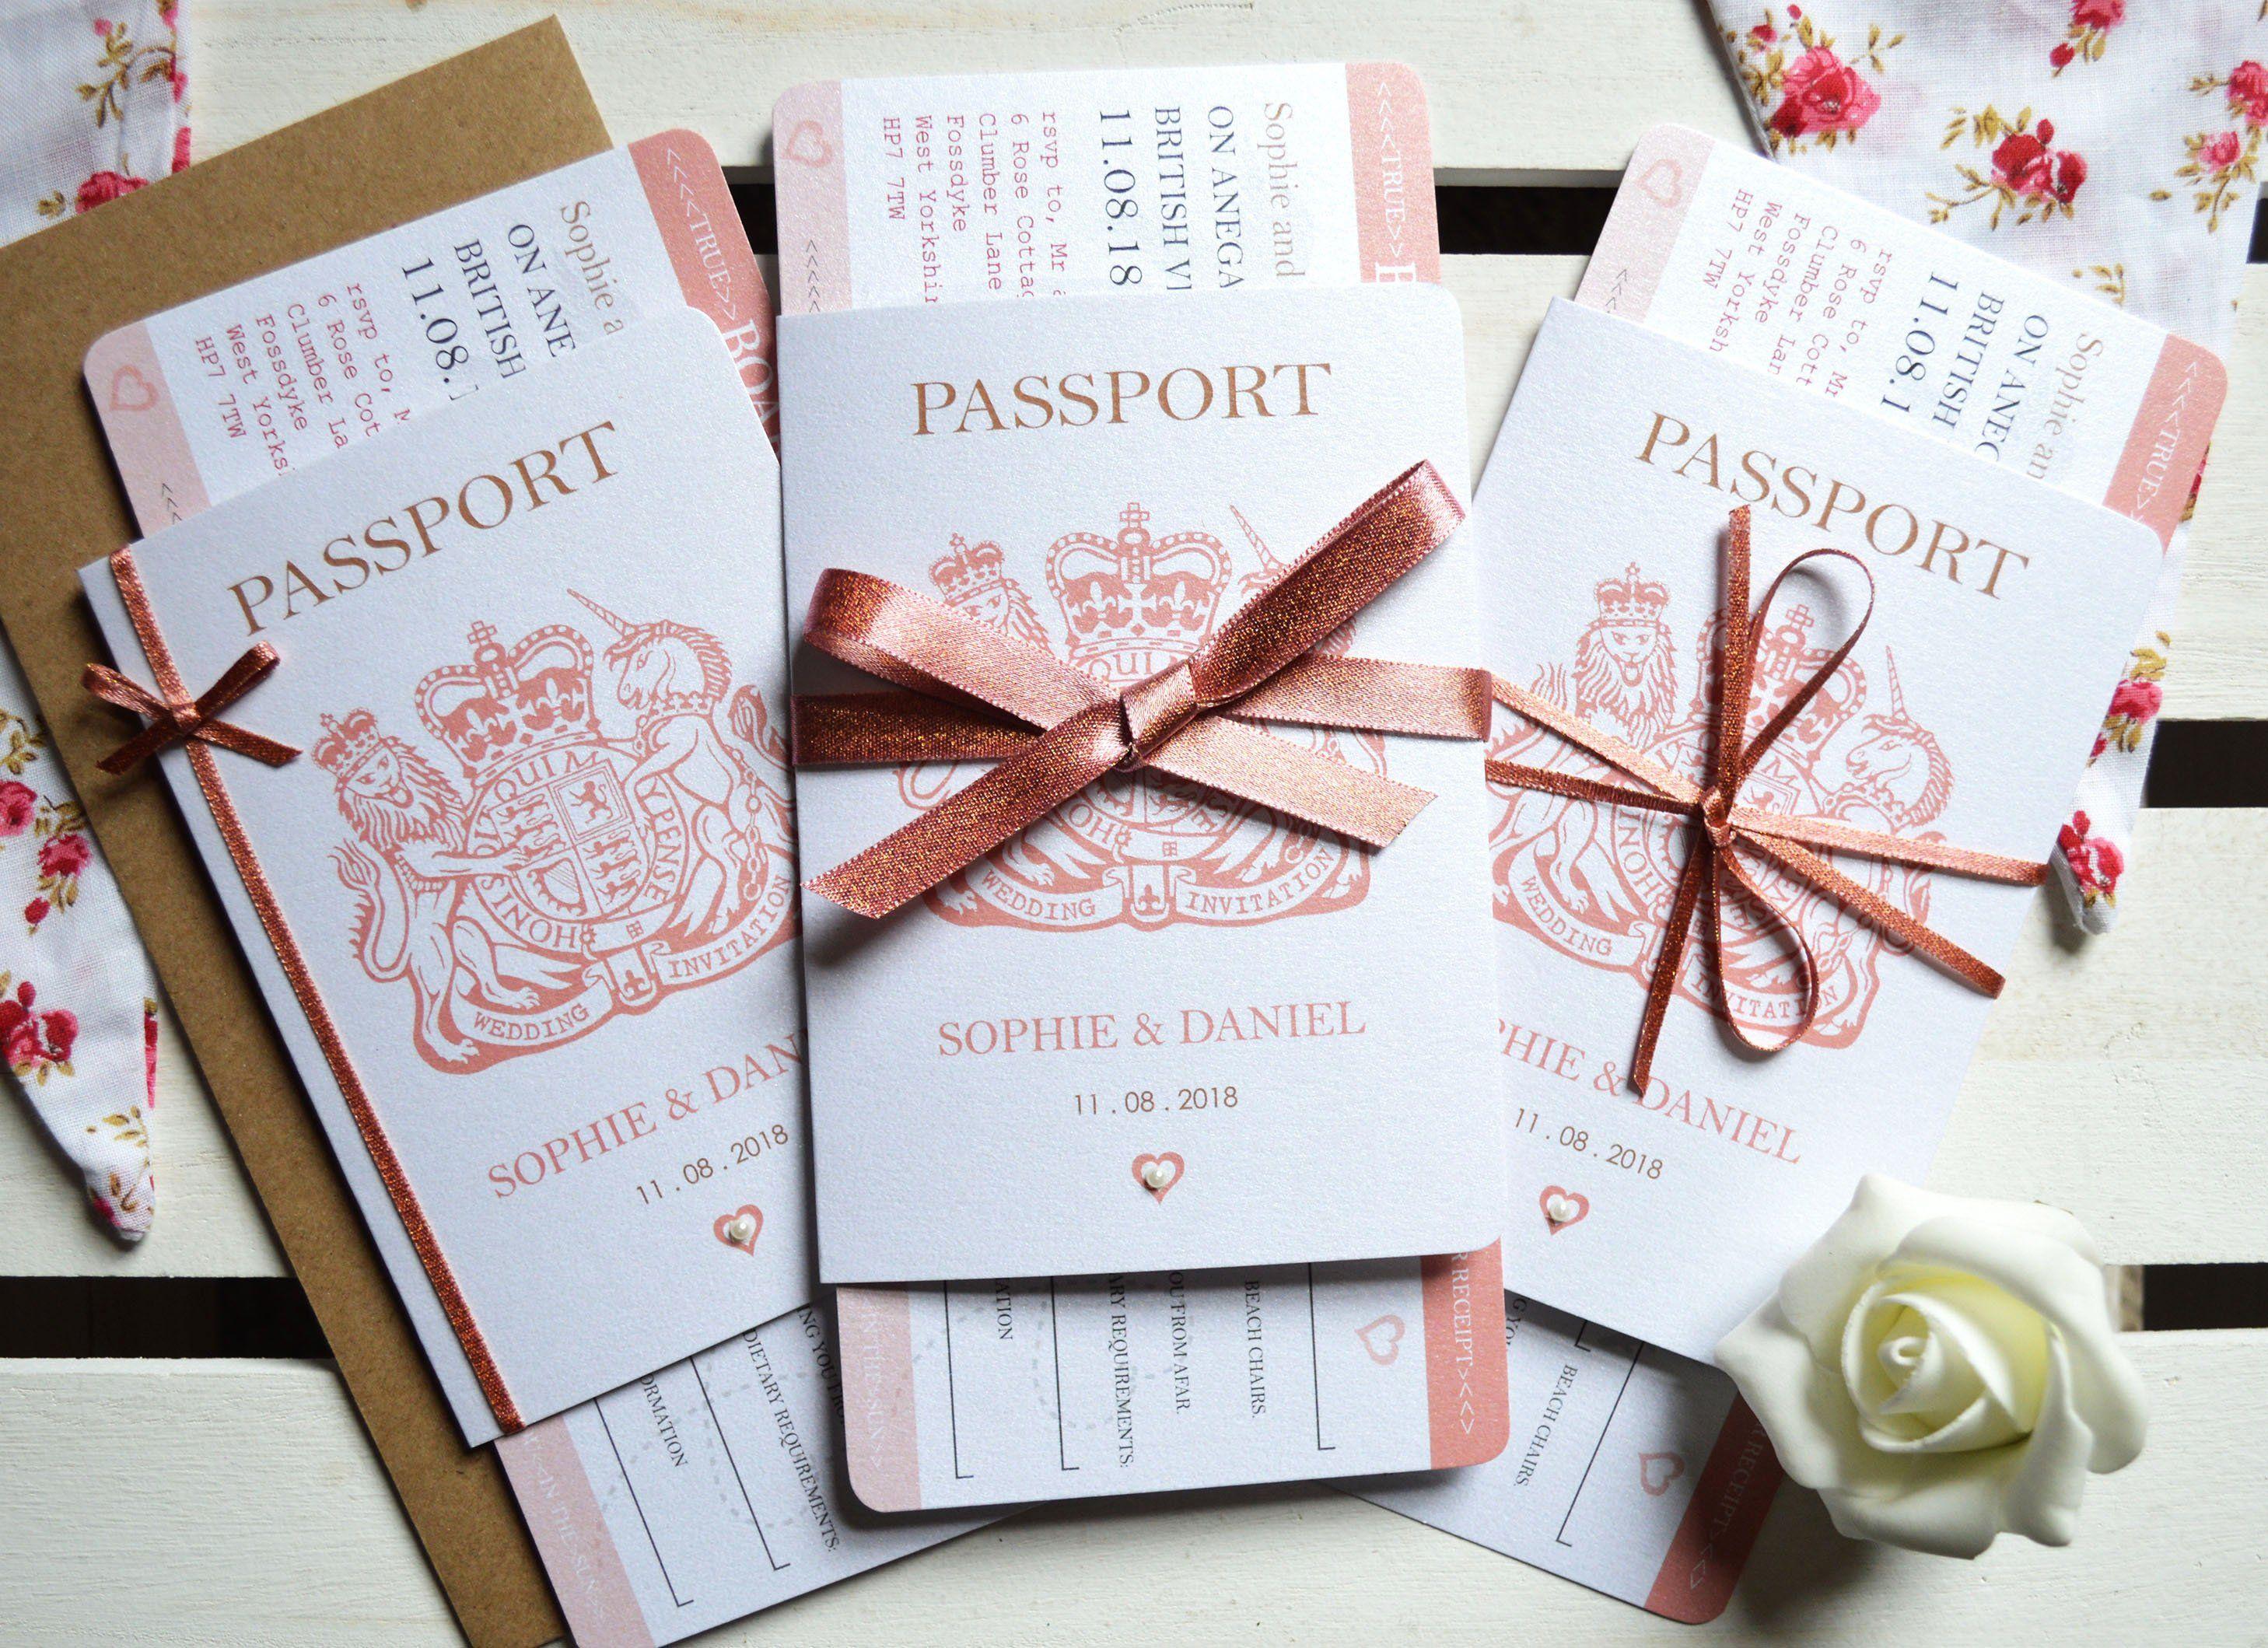 Rose Gold Sparkle Passport Wedding Invitation Sample Boarding Etsy Passport Wedding Invitations Wedding Invitation Samples Passport Wedding